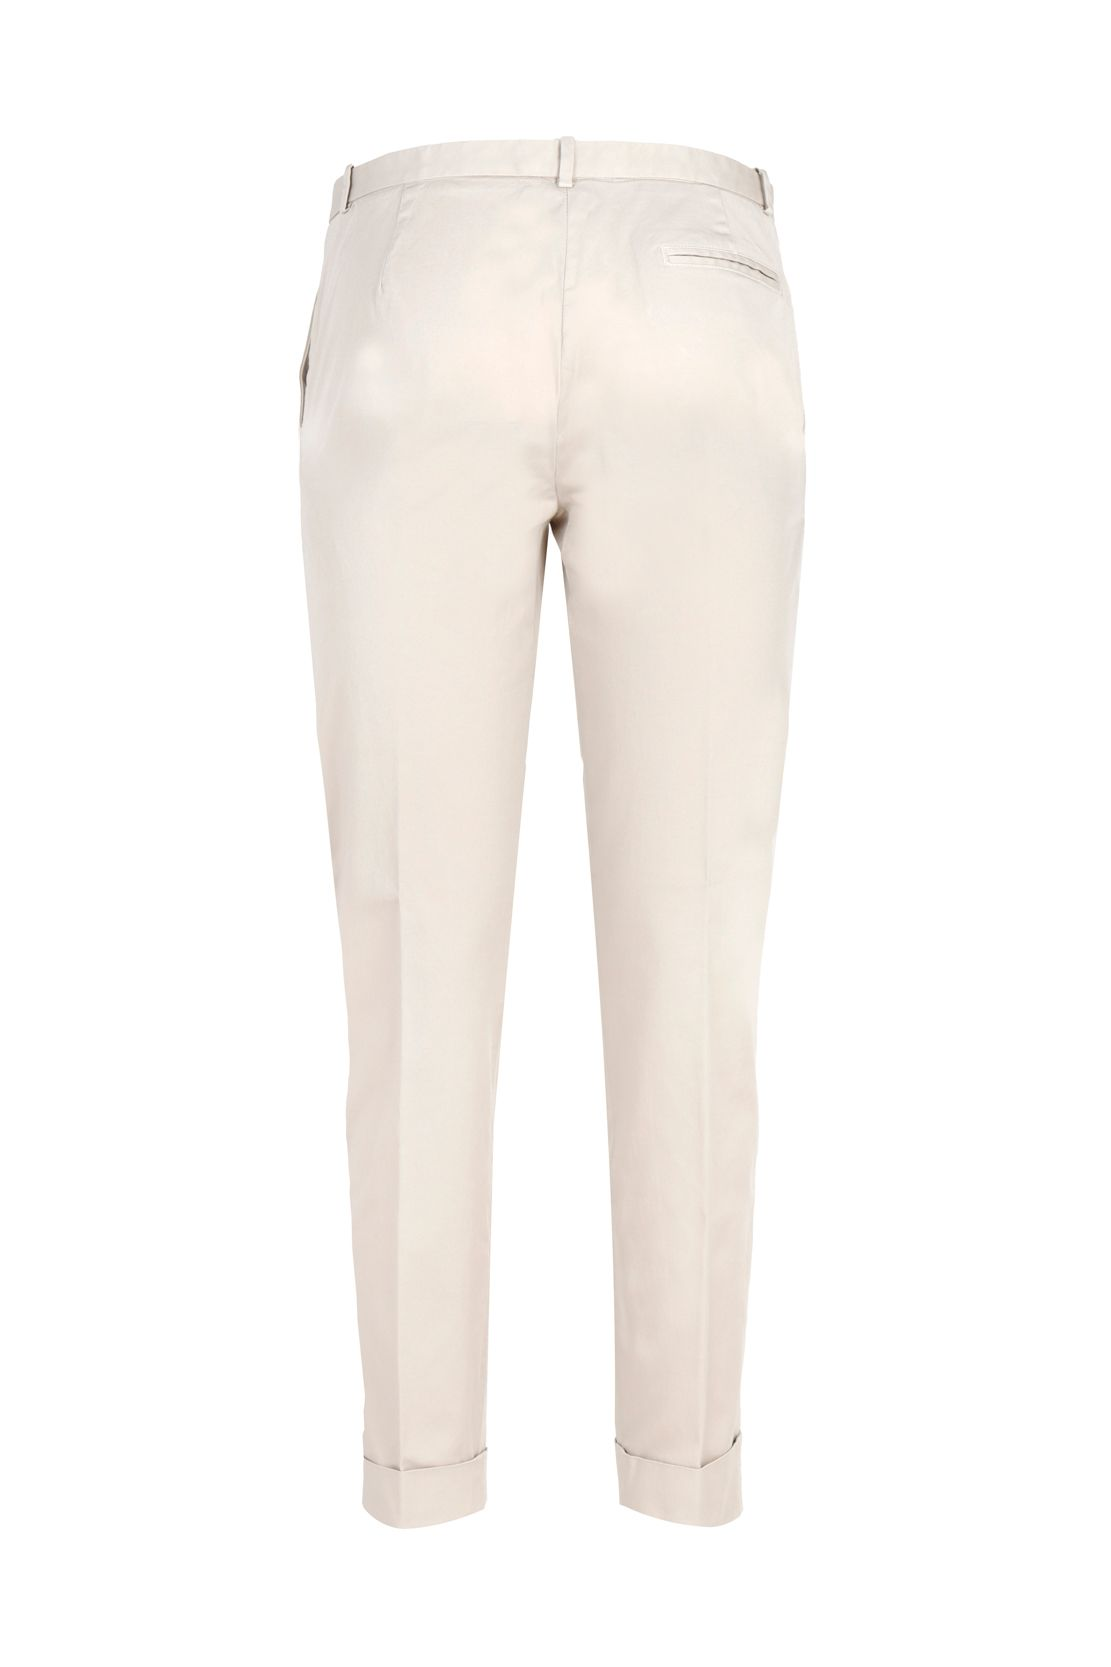 FABIANA FILIPPI Cottons FABIANA FILIPPI WOMEN'S BEIGE COTTON PANTS